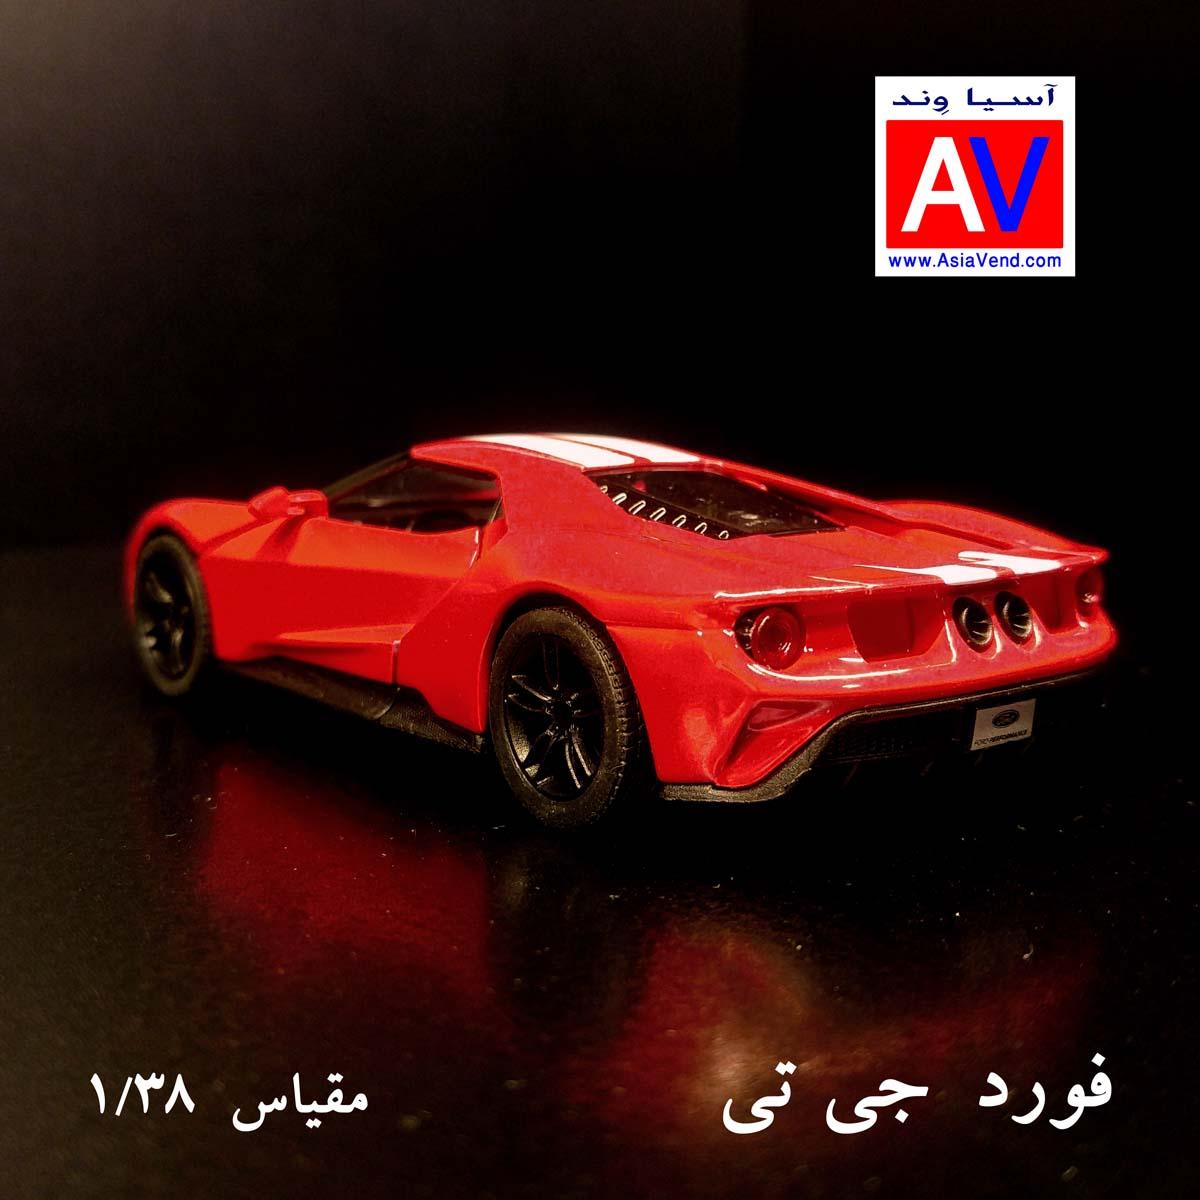 فورد جی تی ماکت ماشین فلزی فورد مقیاس 1/32 رنگ قرمز Ford GT Model Car